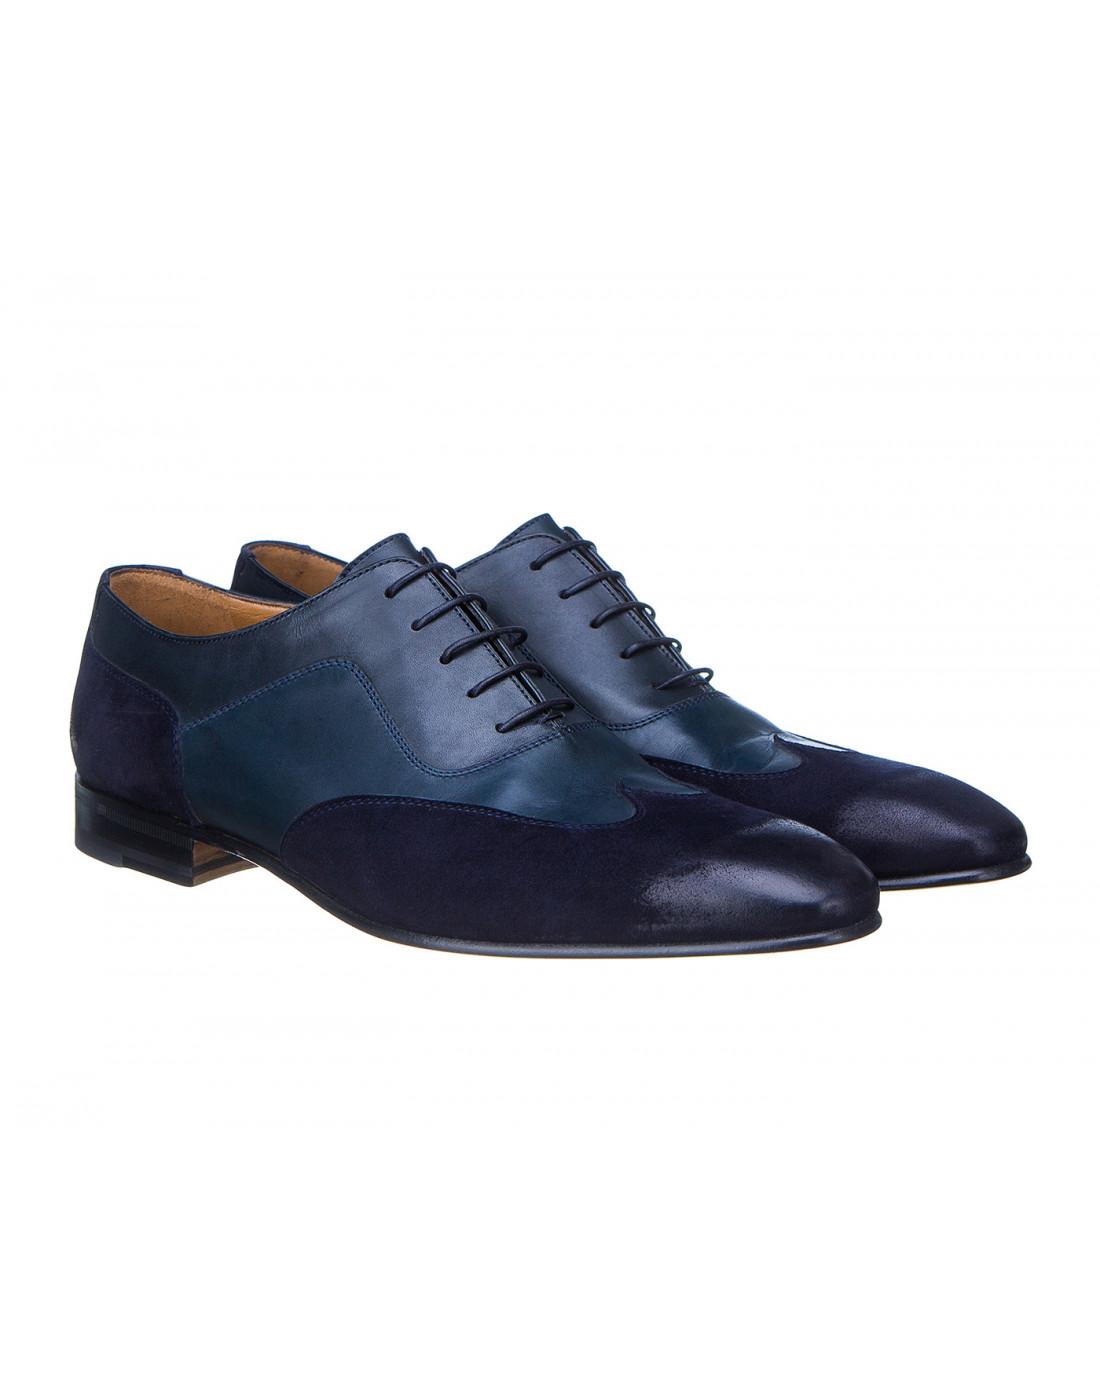 Туфли синие мужские Moreschi S42619 BLUE-2